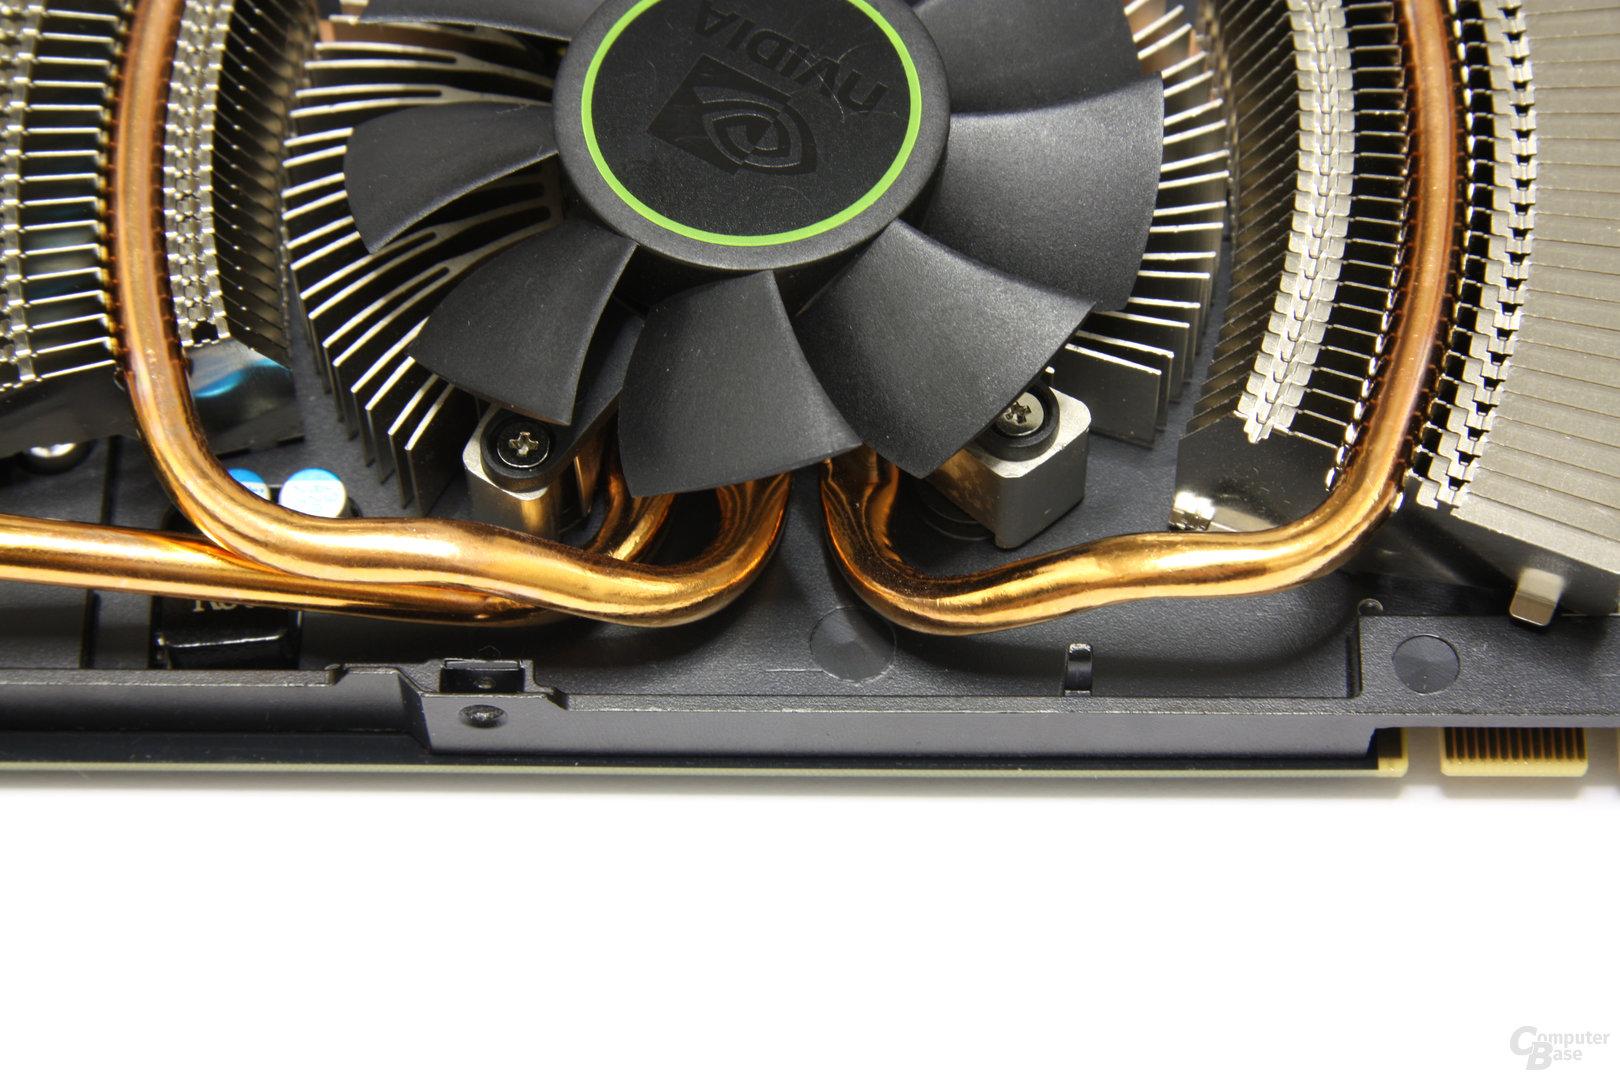 GeForce GTX 560 Ti Heatpipes